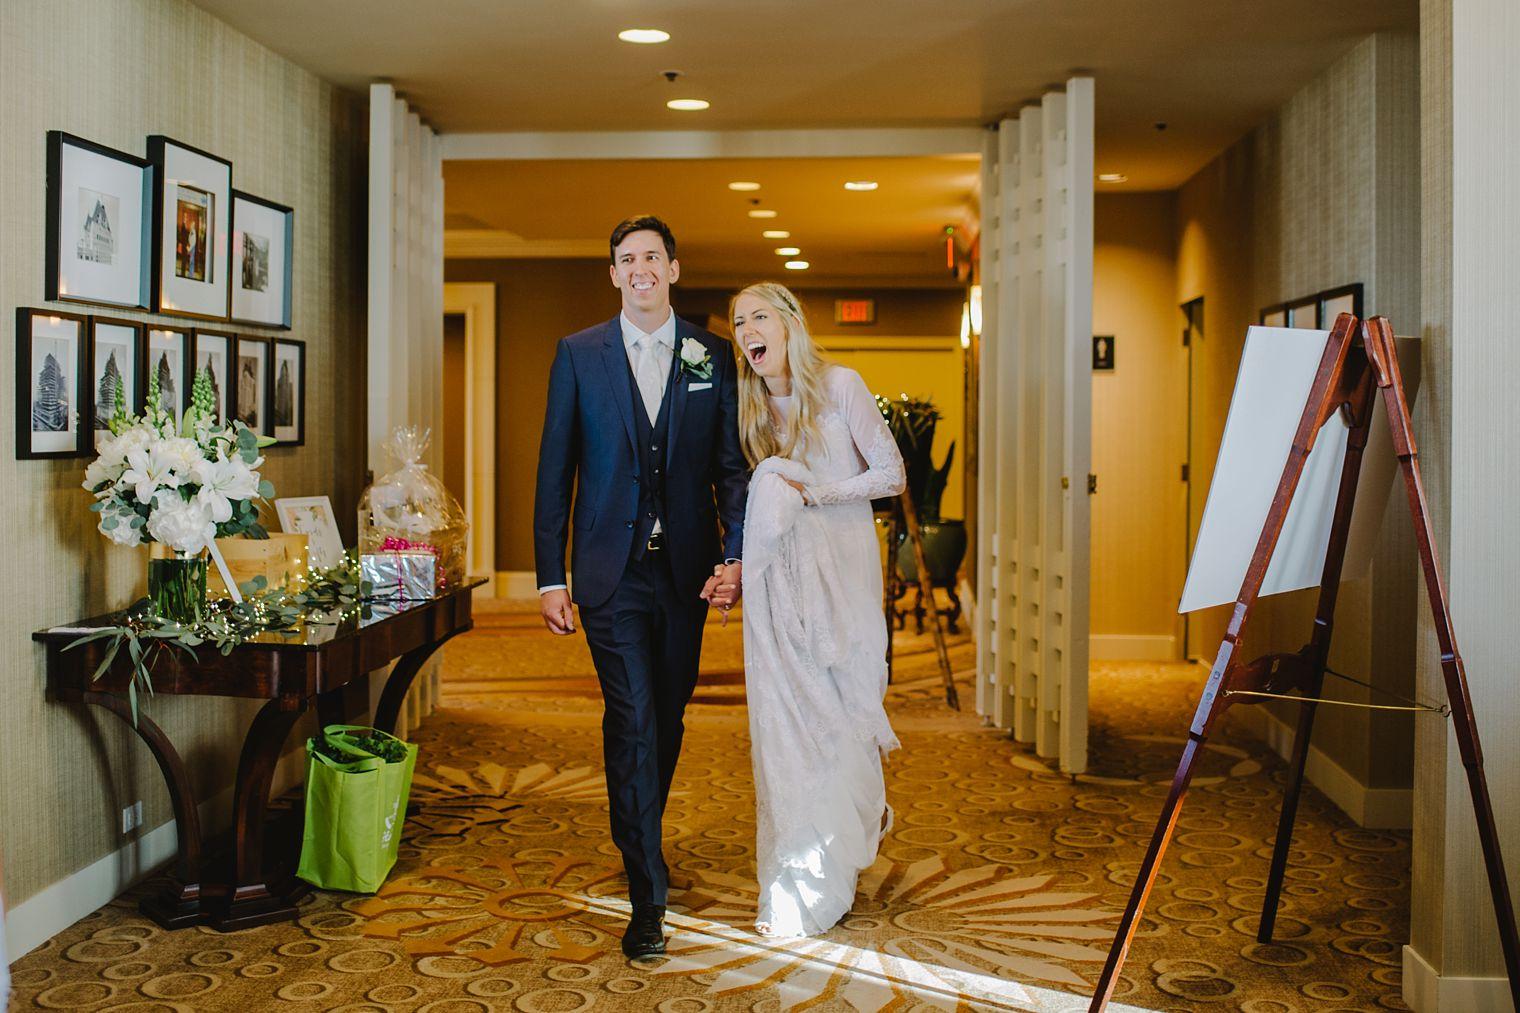 wedding entrance at fairmont hotel vancouver